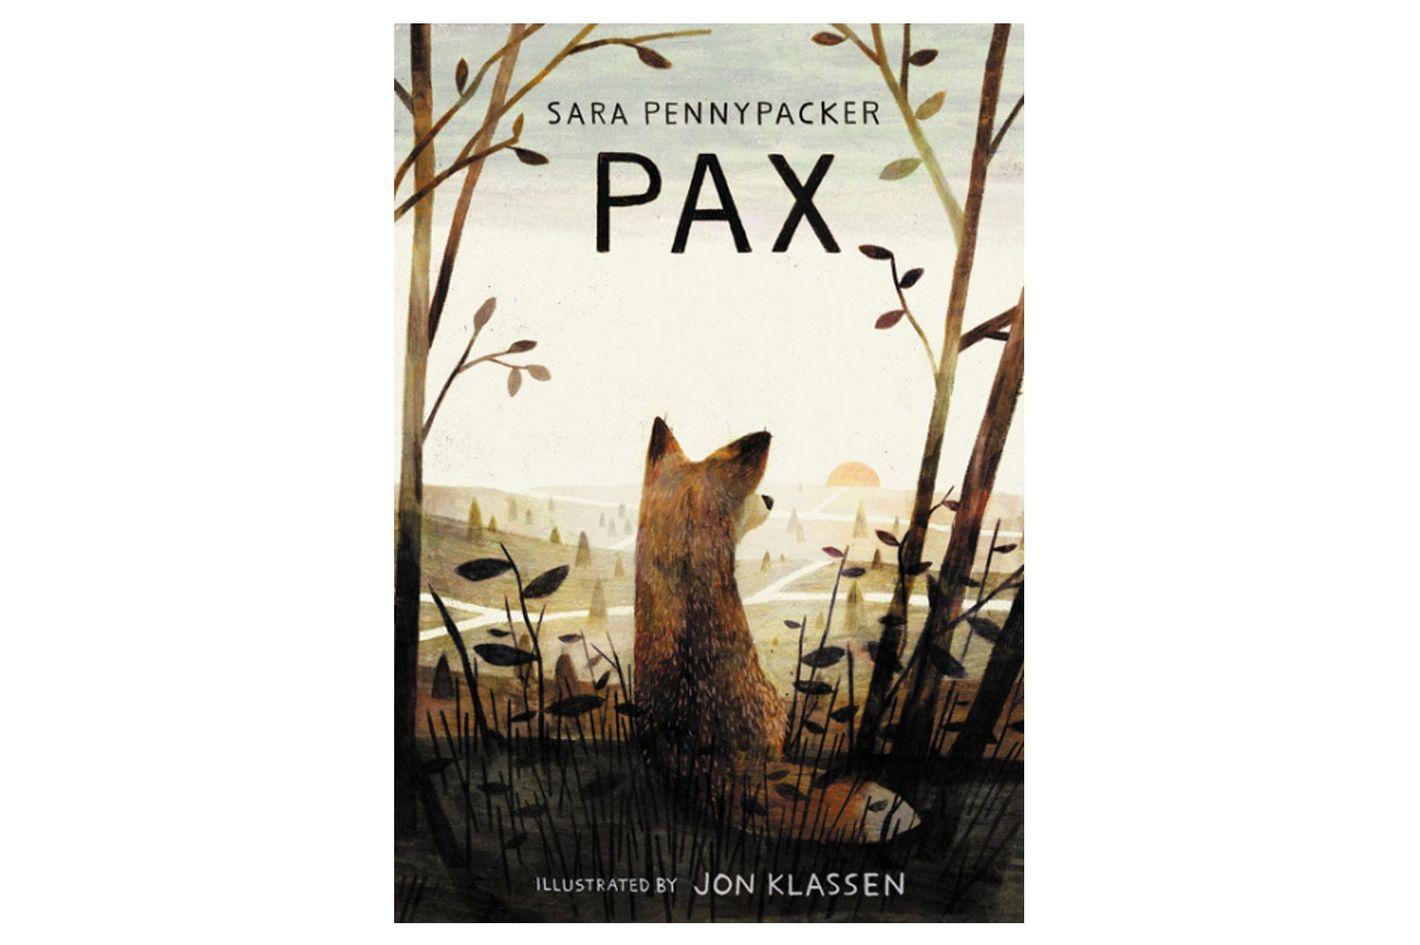 """Pax,"" by Sara Pennypacker, illustrated by Jon Klassen"